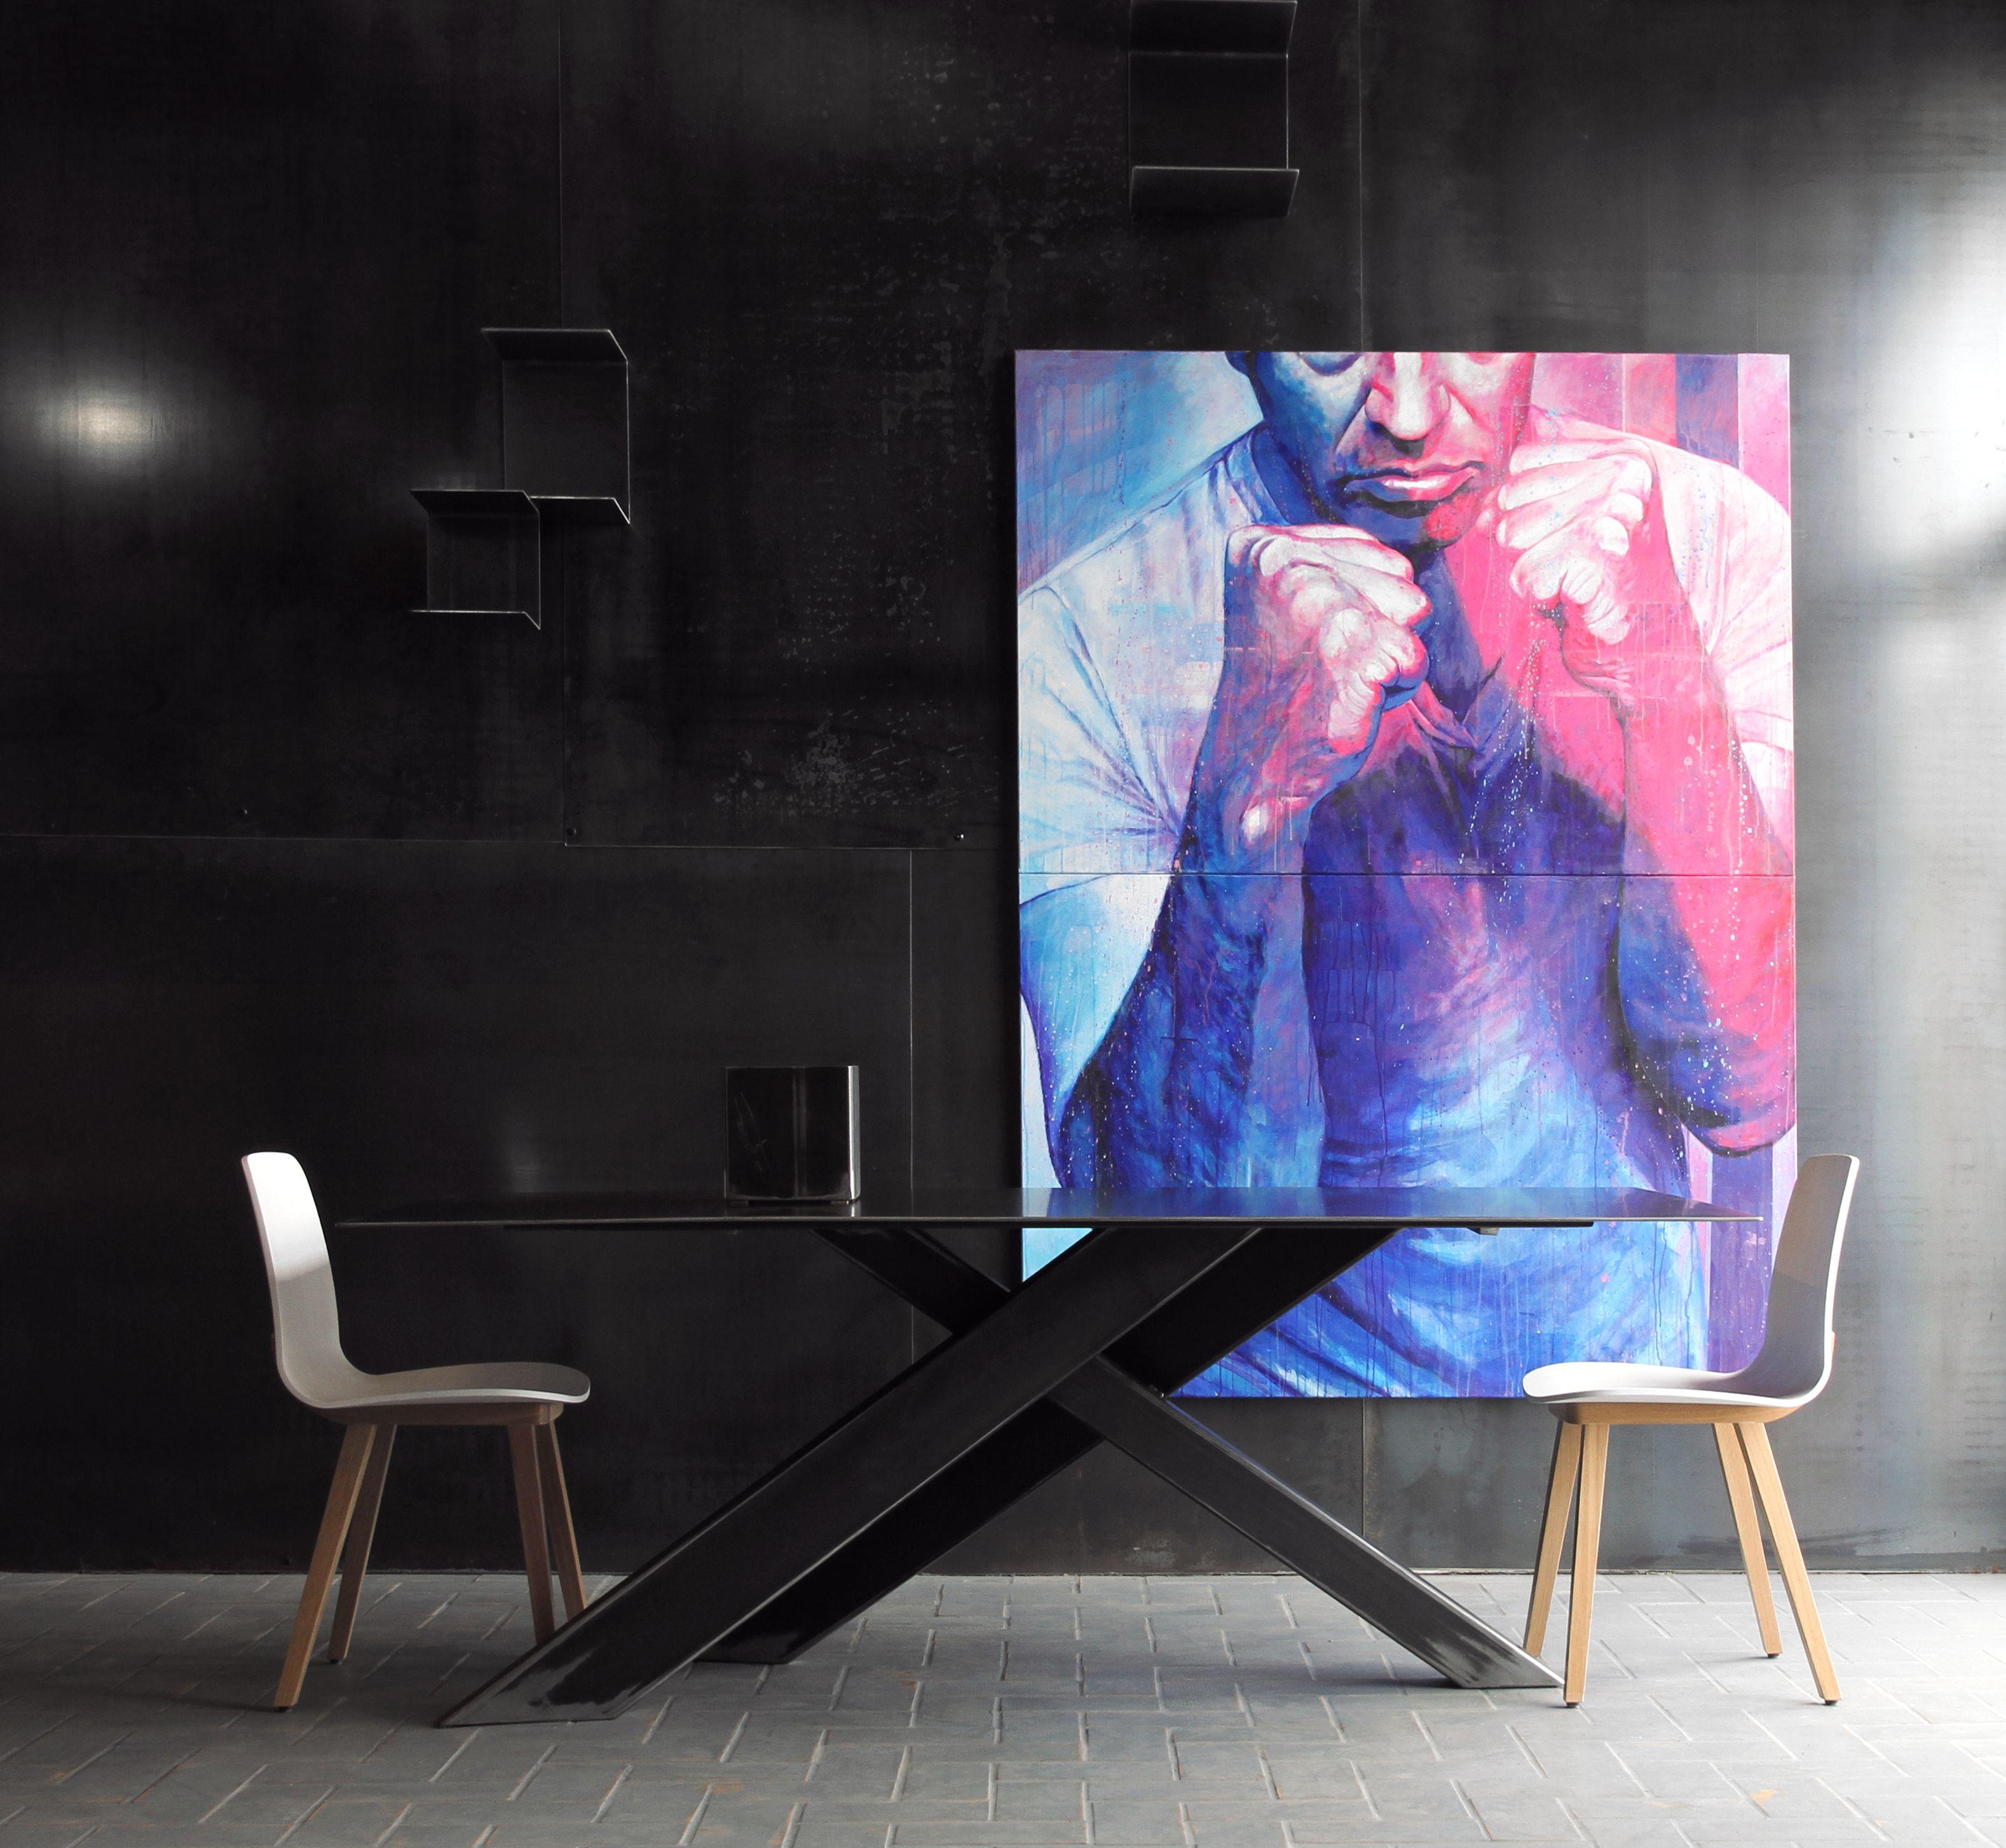 blunt collection flower show room in biarritz france blunt manufacture. Black Bedroom Furniture Sets. Home Design Ideas